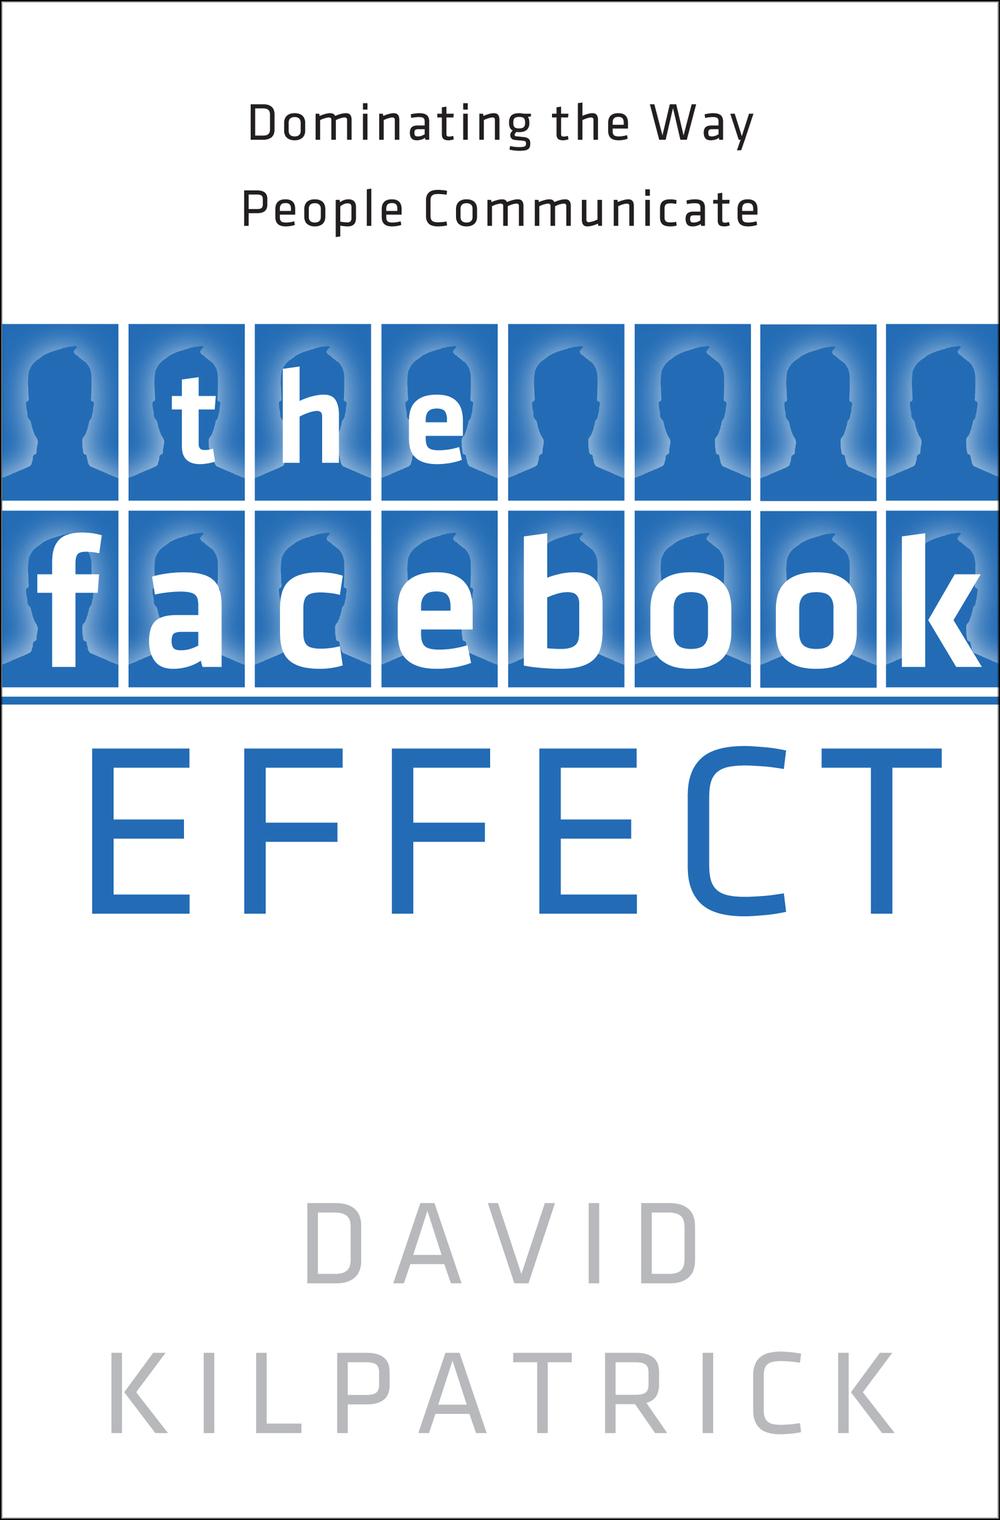 THE-FACEBOOK-EFFECT-comp2-ss6.jpg